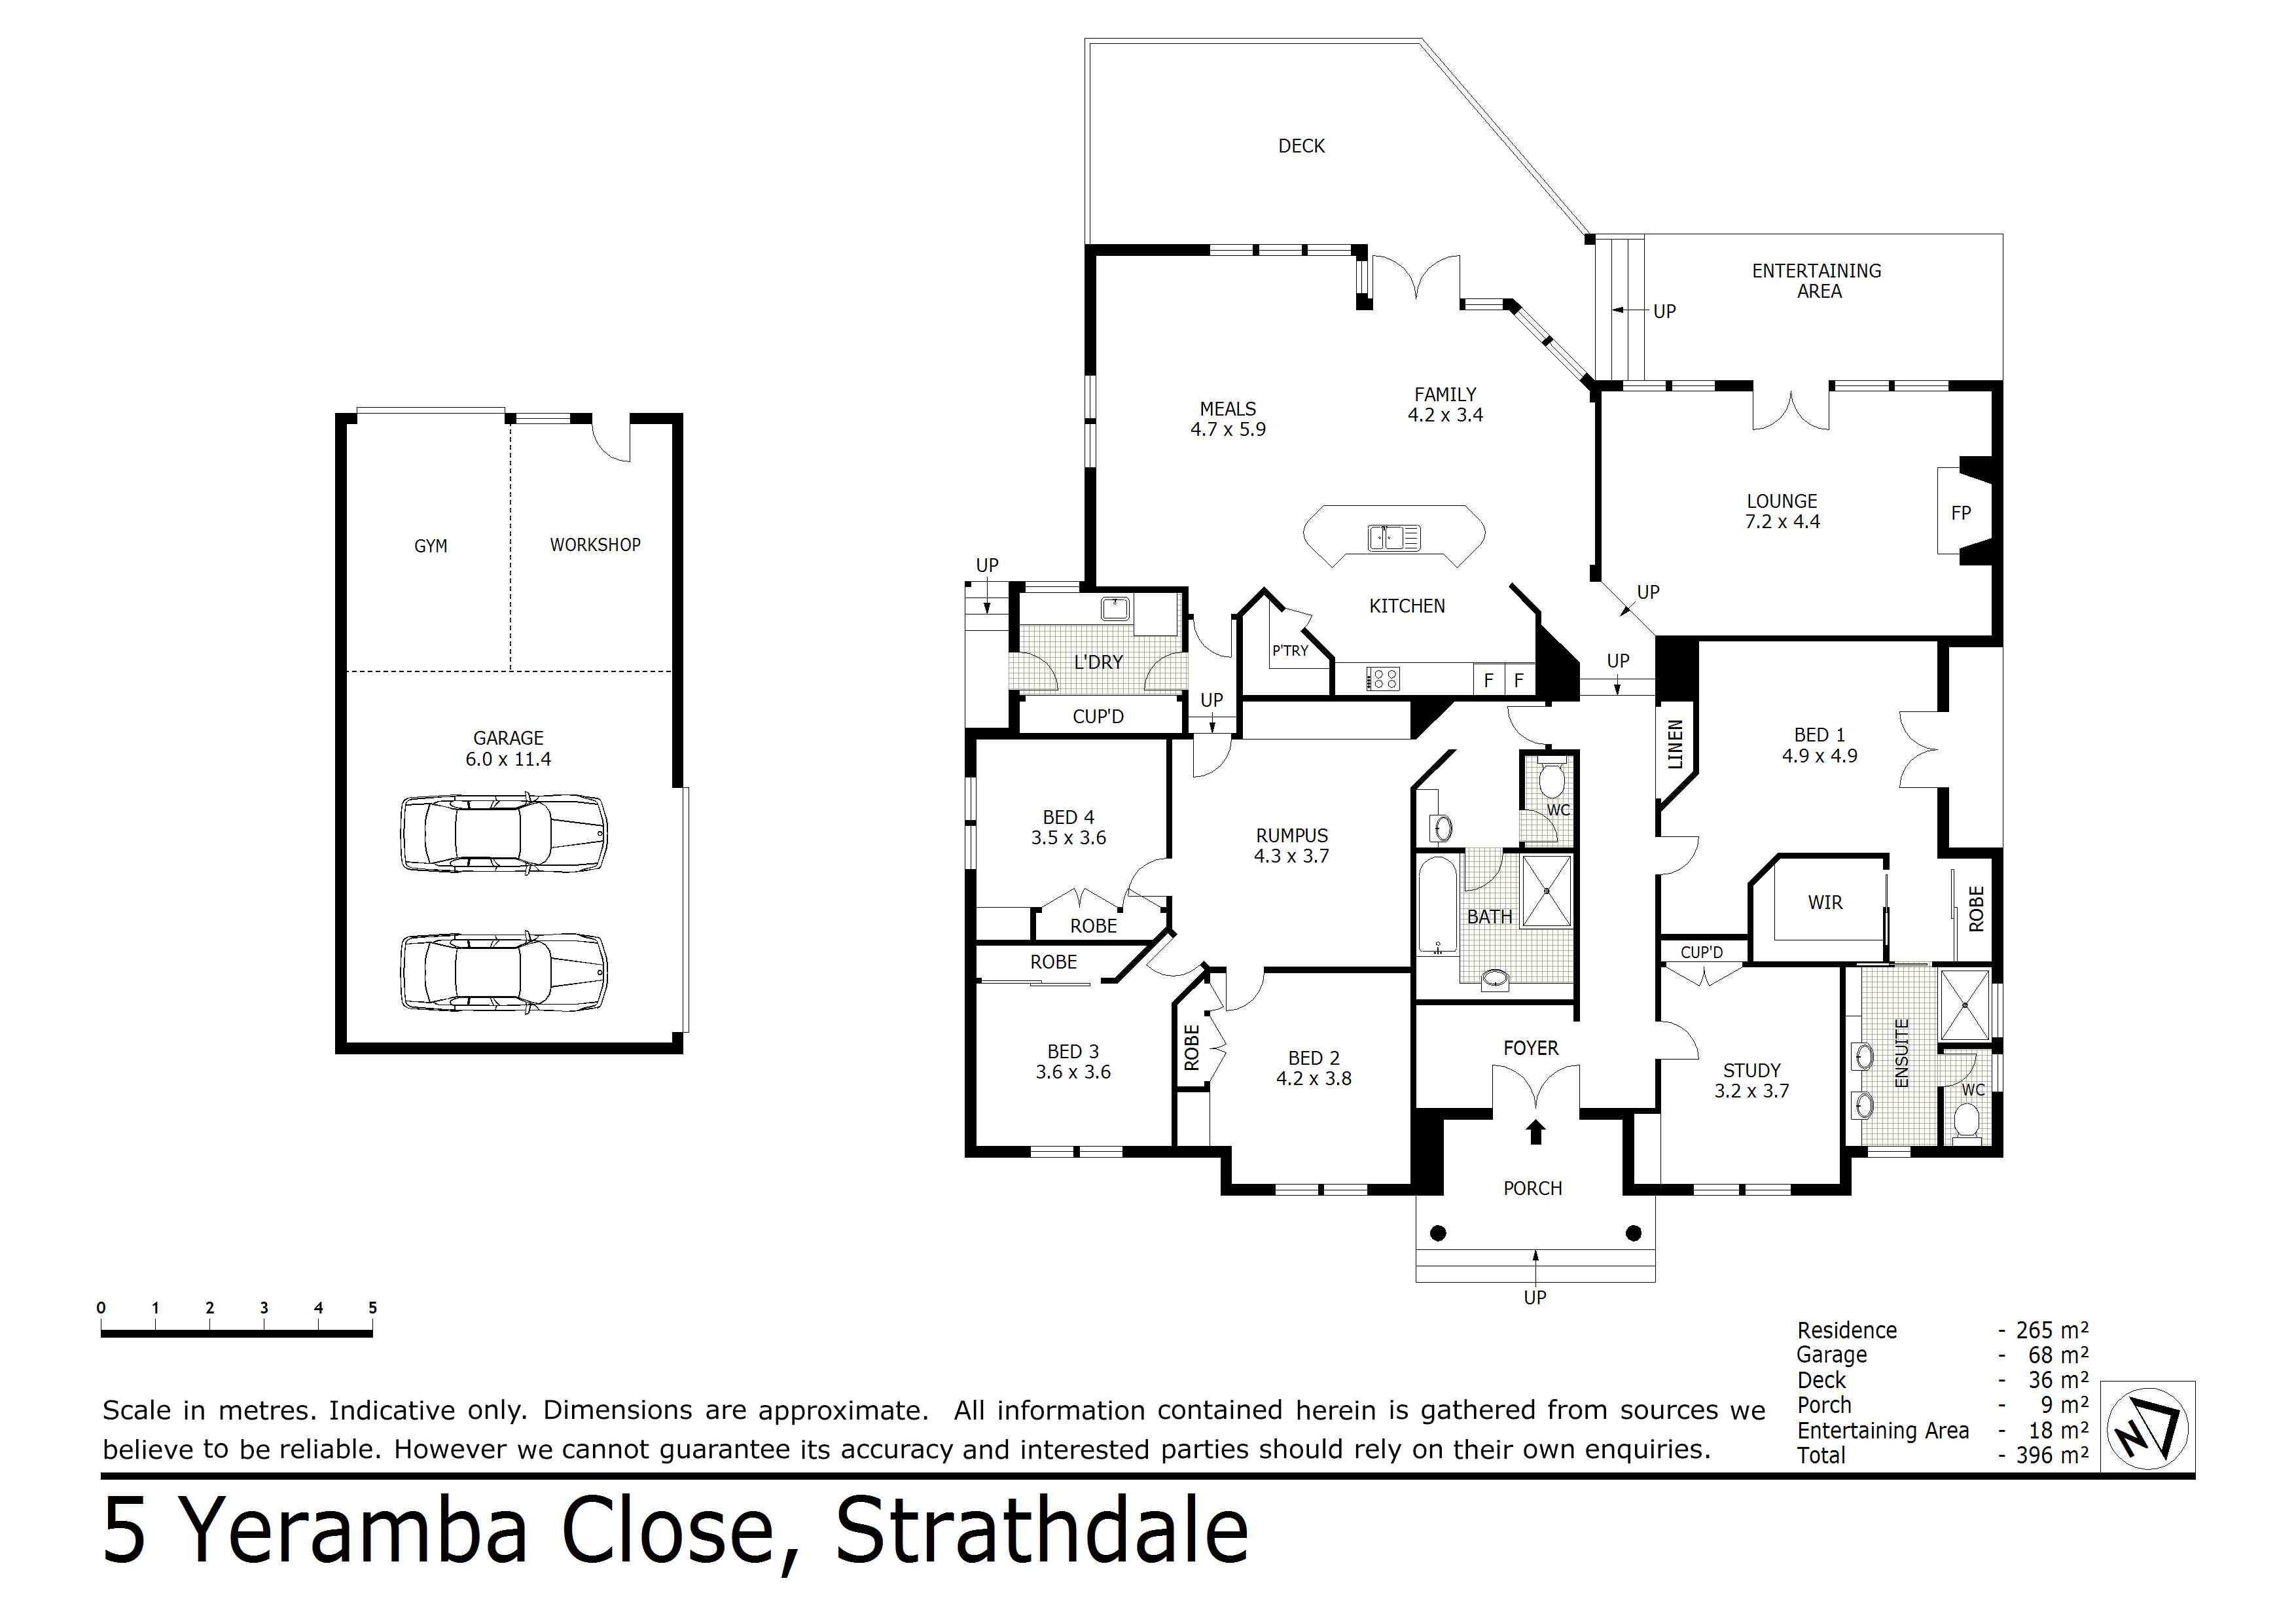 5 Yeramba Close, Strathdale, VIC 3550